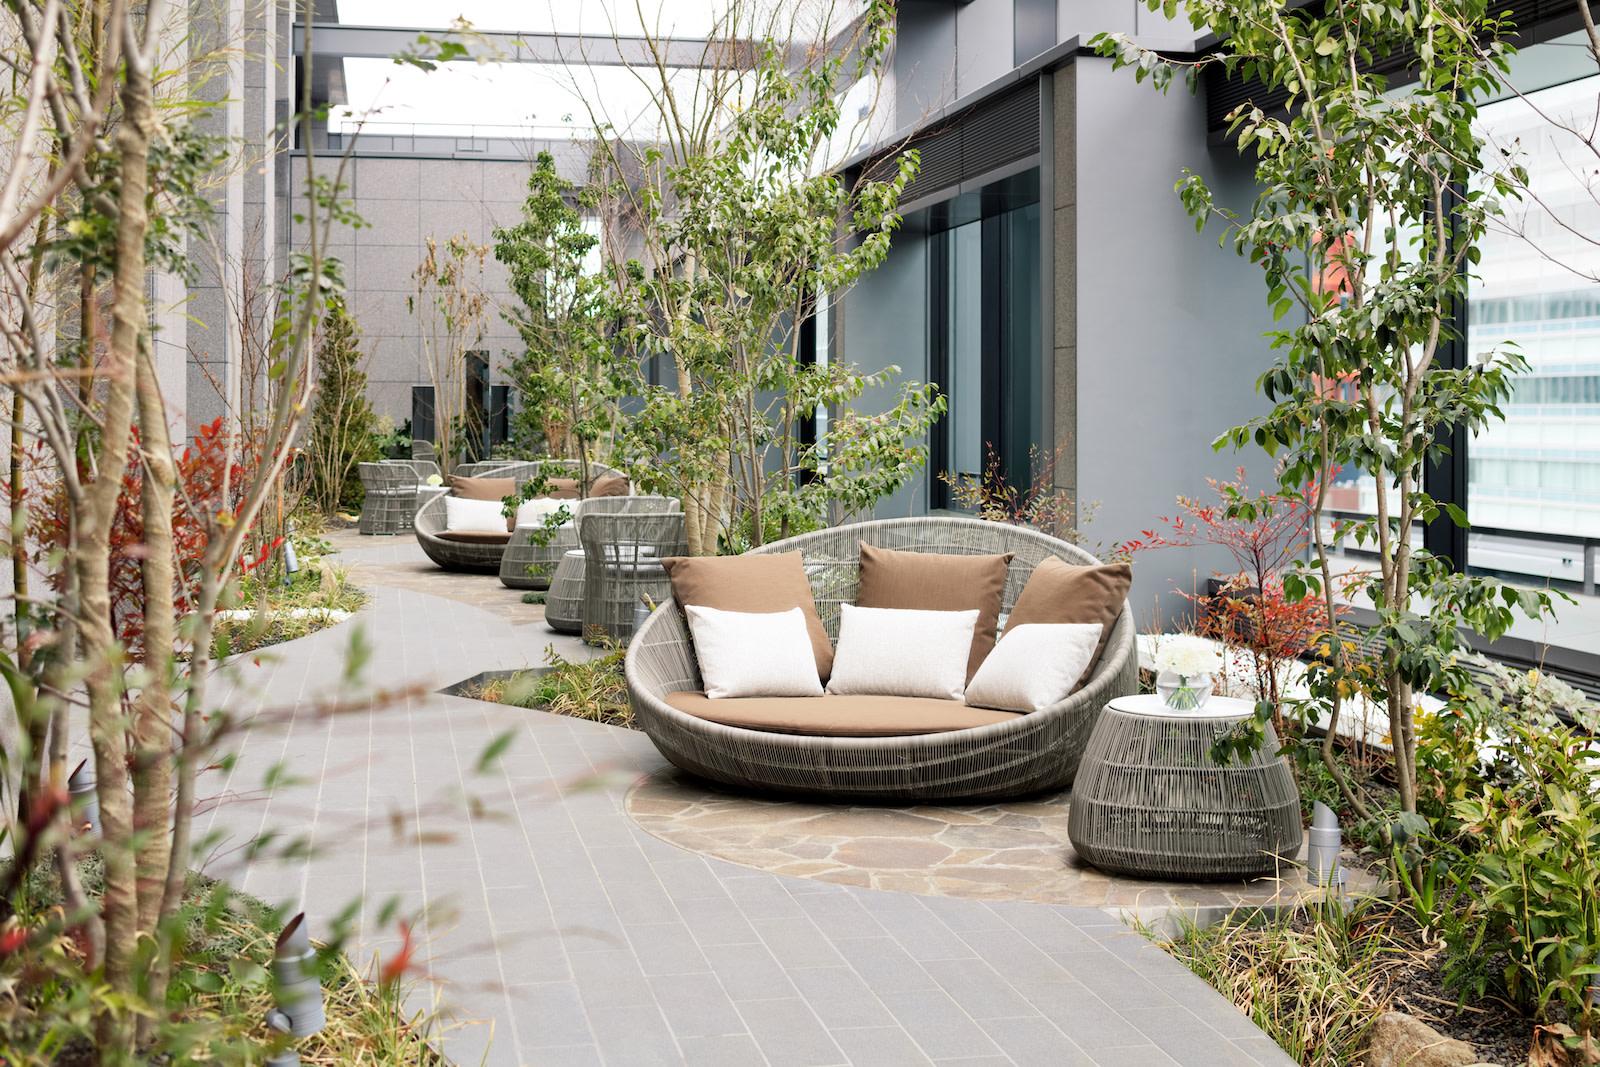 SR Japan Tokyo Asc Marunouchi Terrace-HR アスコット丸の内東京 | Workations(ワーケーションズ)